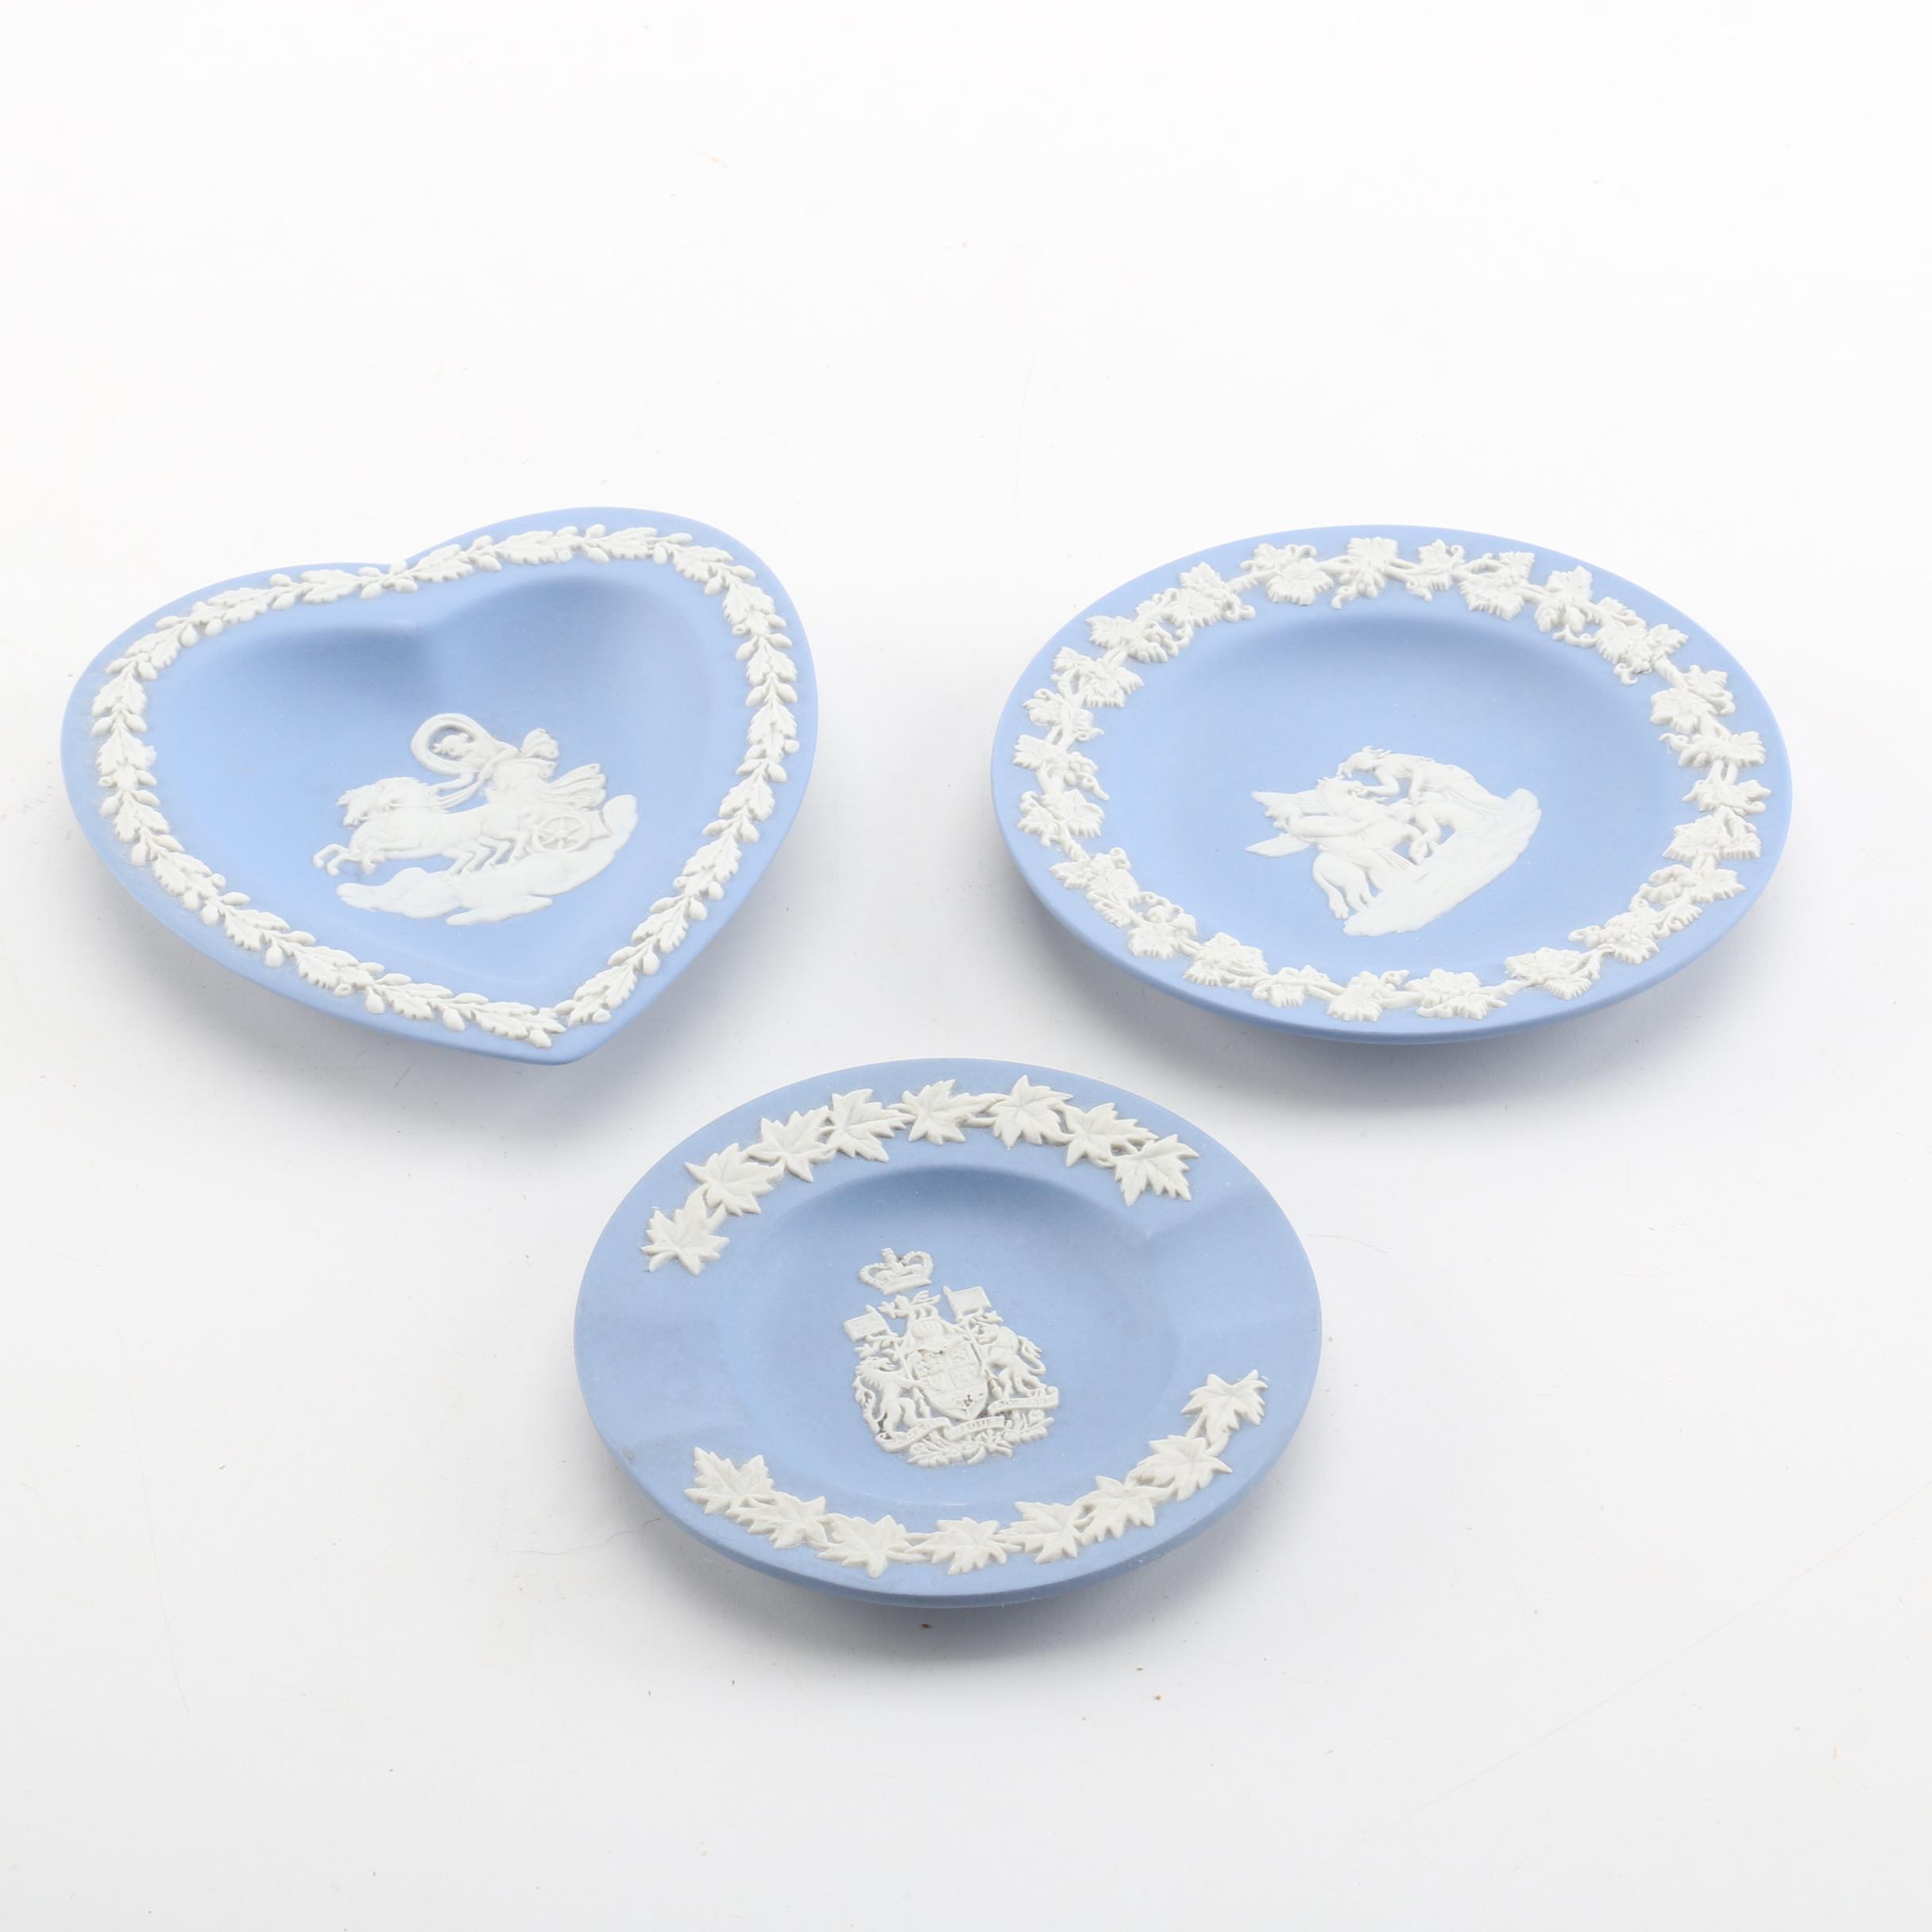 Wedgwood Blue Jasperware Plates